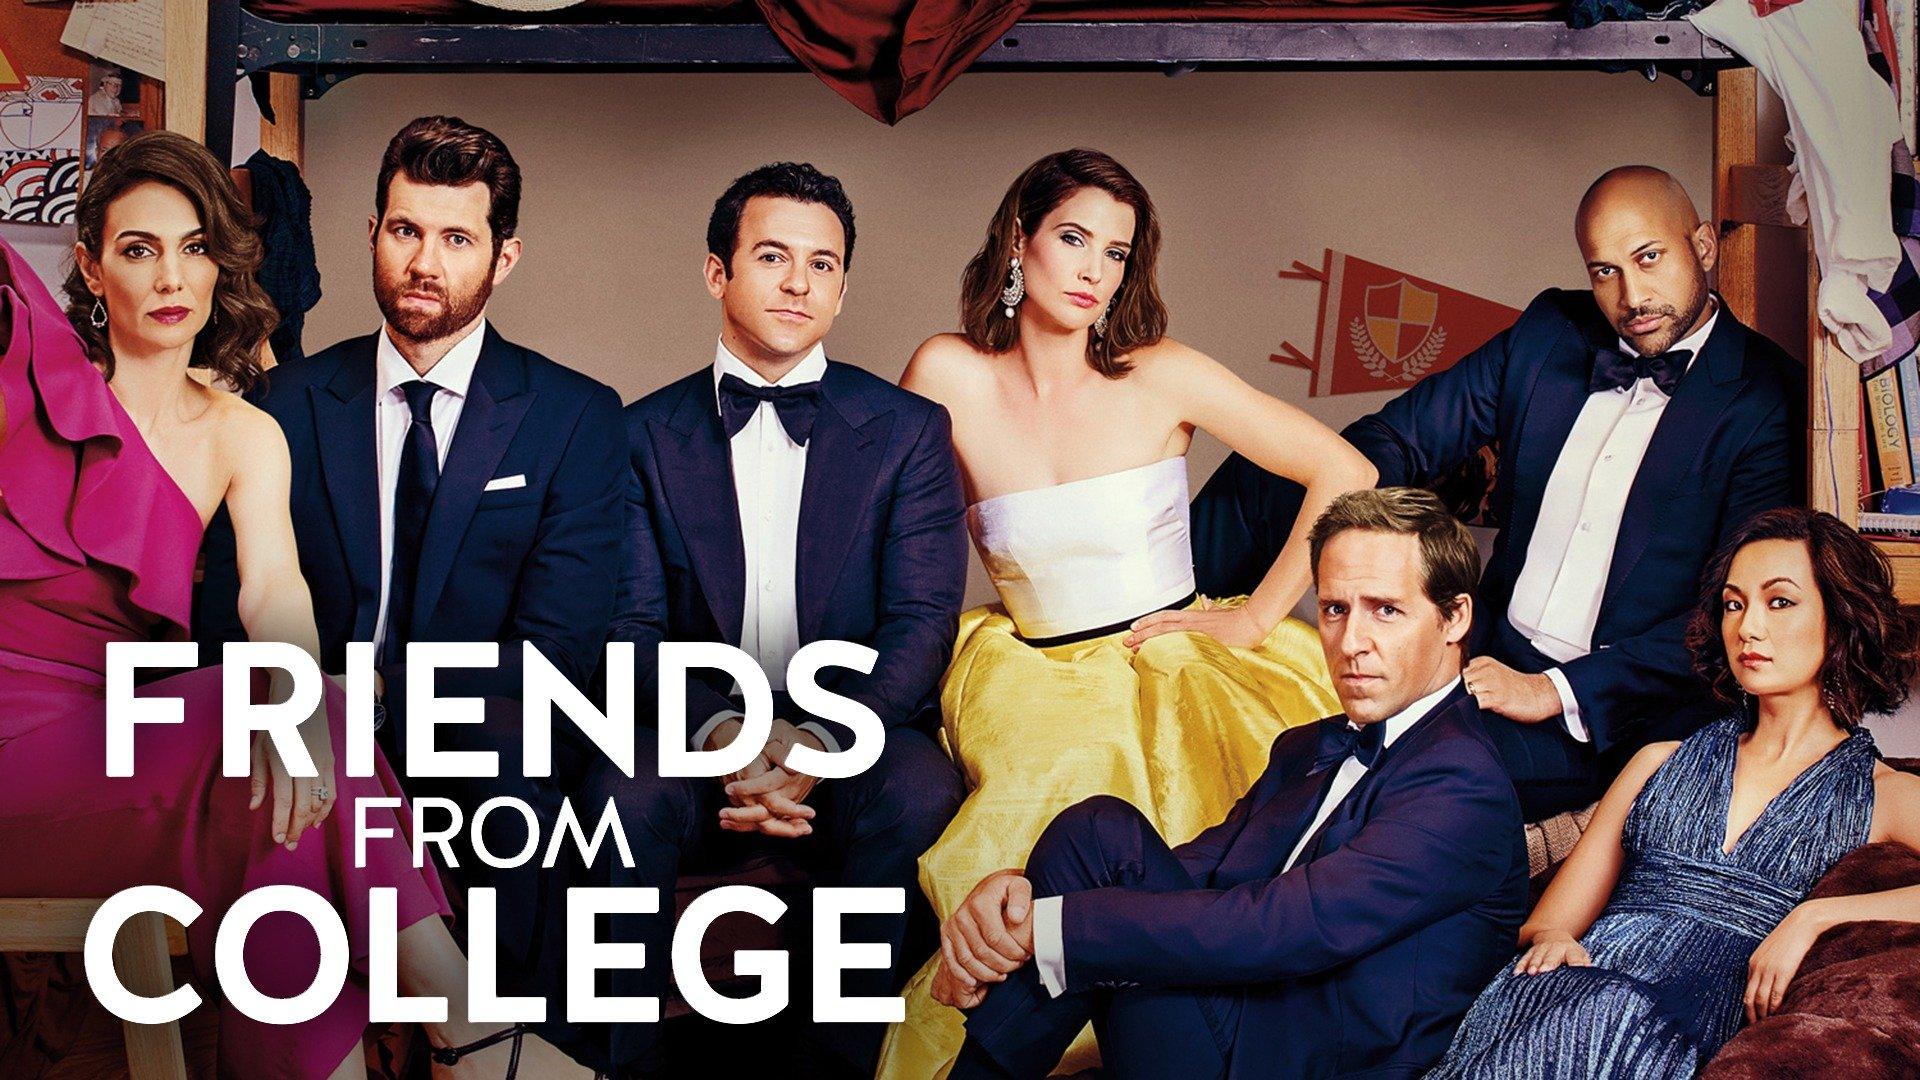 Friends From College - Netflix